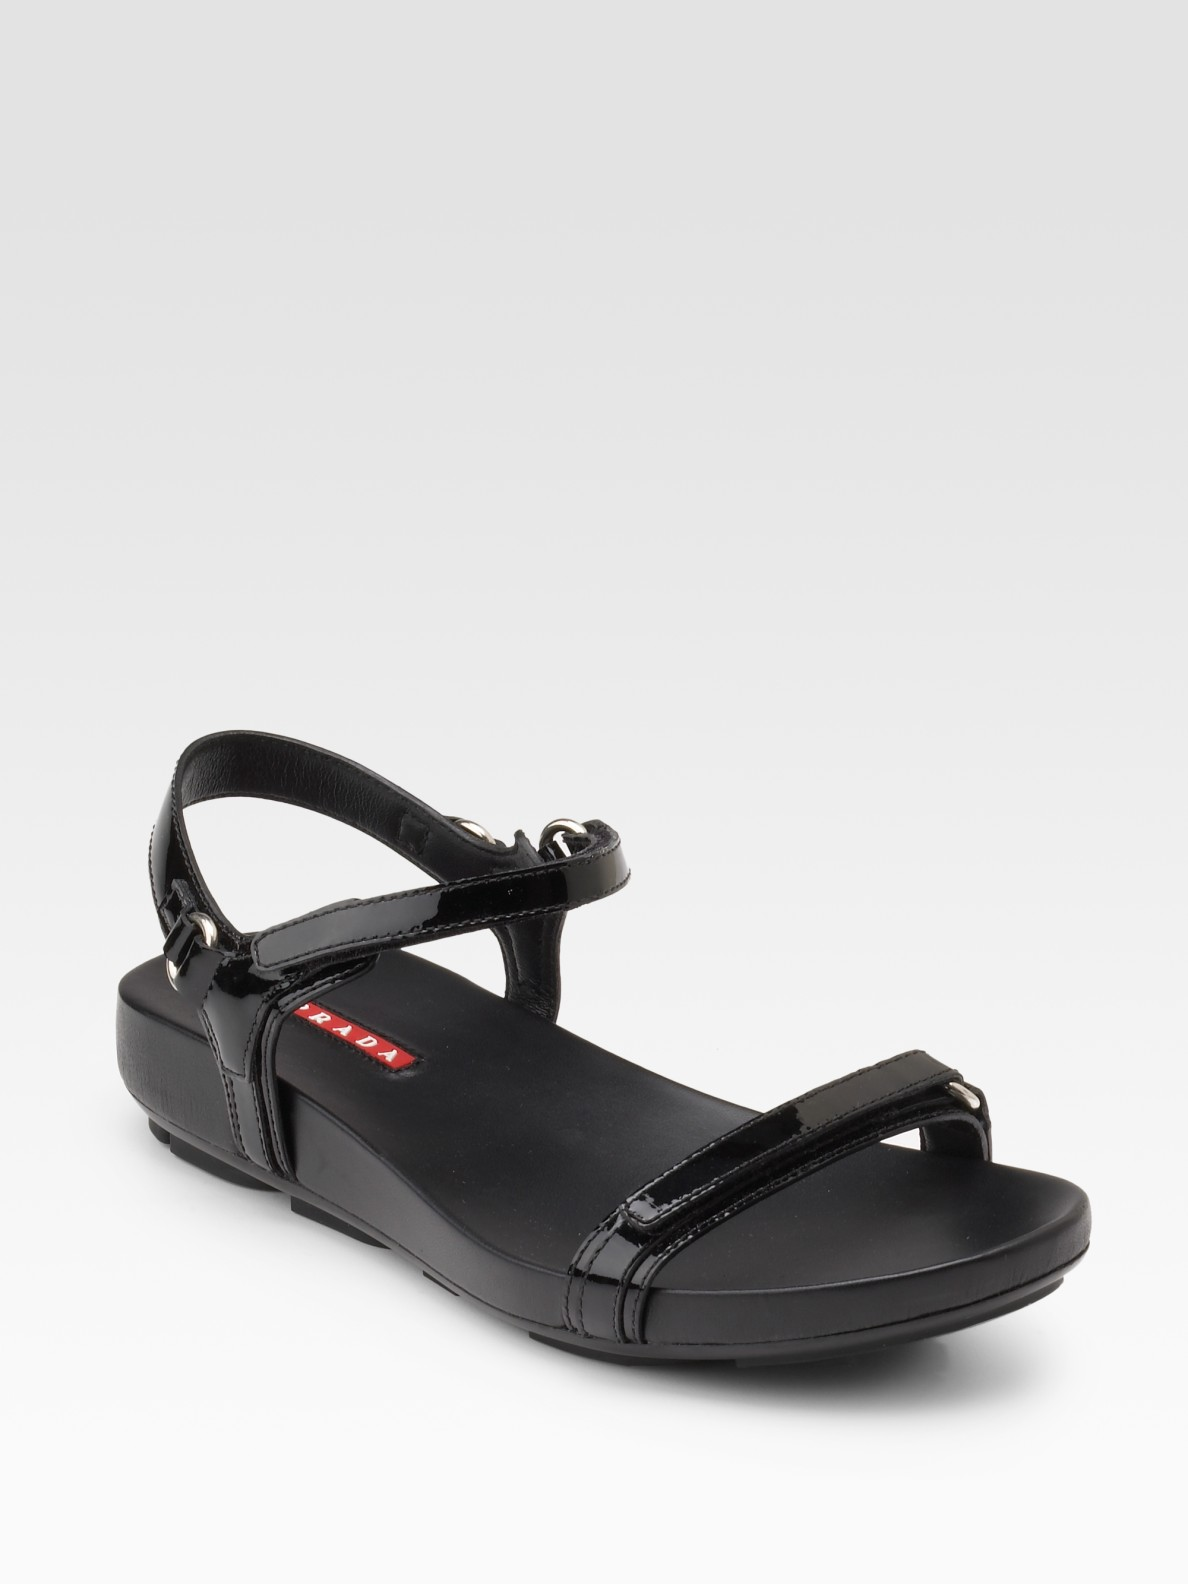 Prada Patent Leather Flat Sandals in